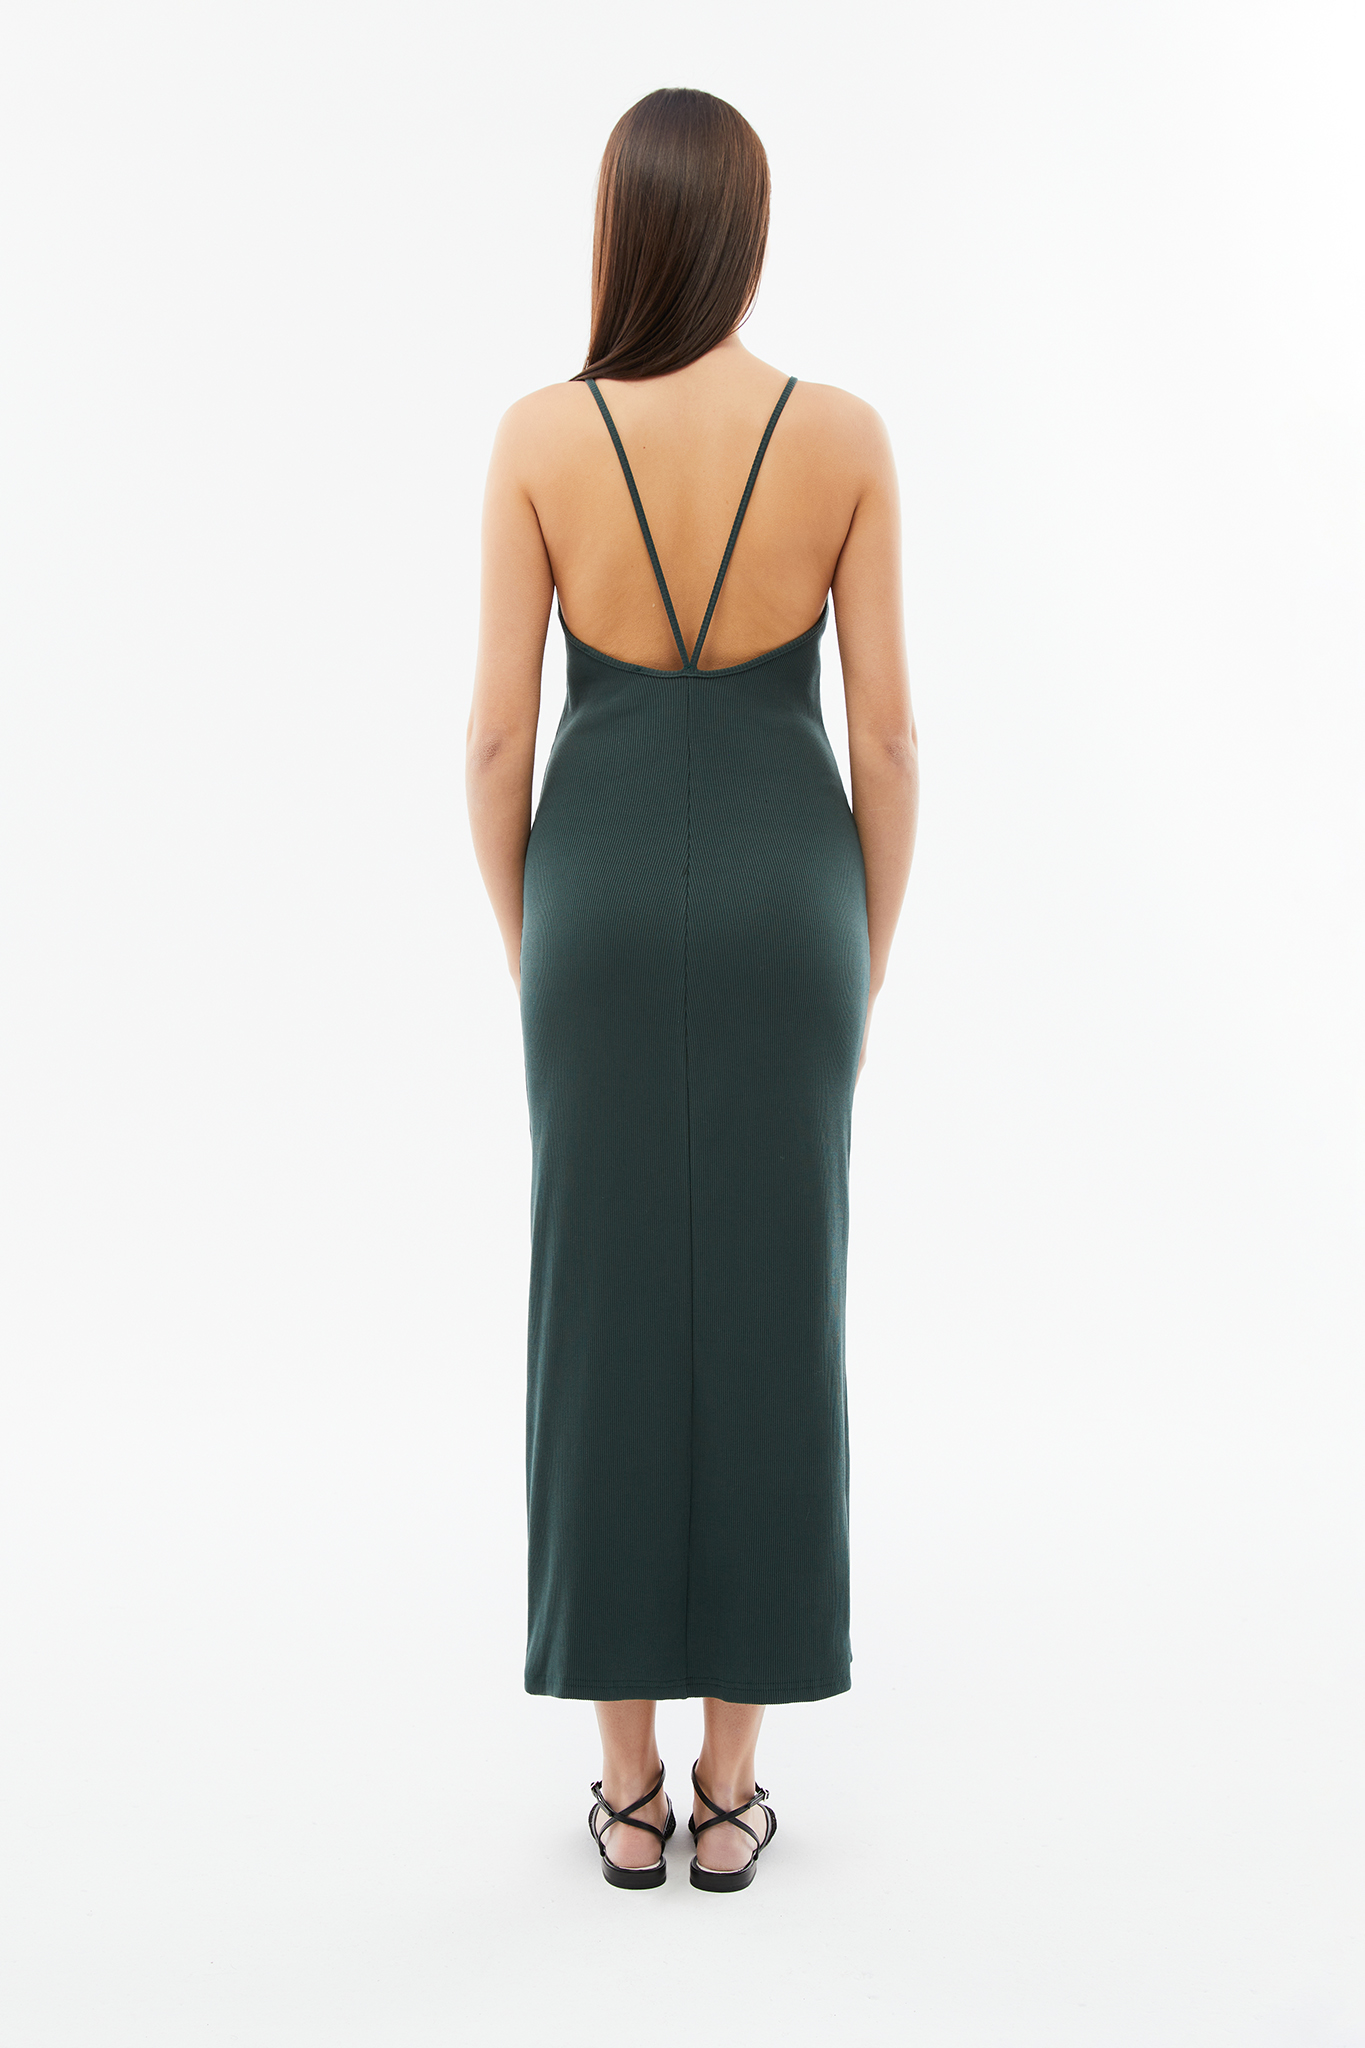 blameyourdaze lowcut back rib dress